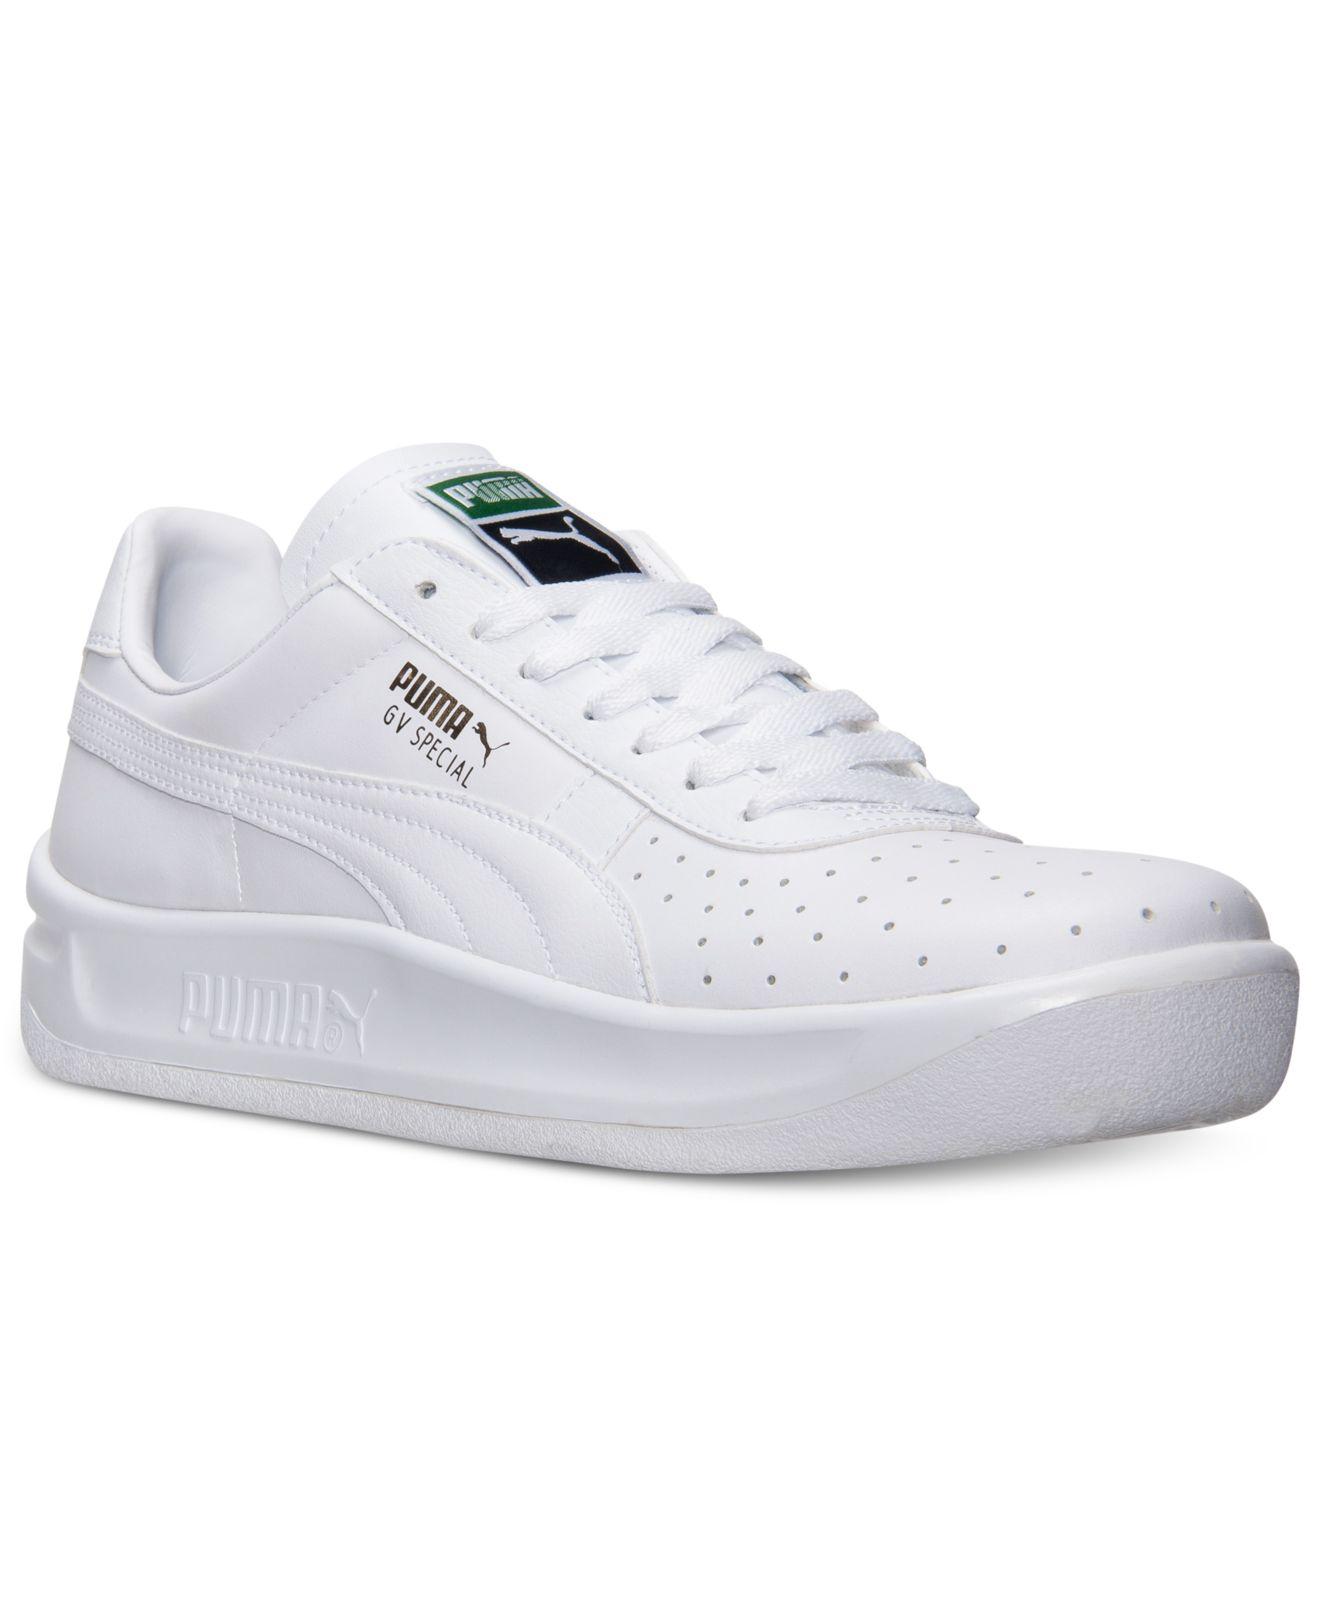 Exact Product: Selena Gomez White Leather Sneakers Street Style Autumn Winter 2019, Brand: Puma, Available on: amazon.com, Price: $60